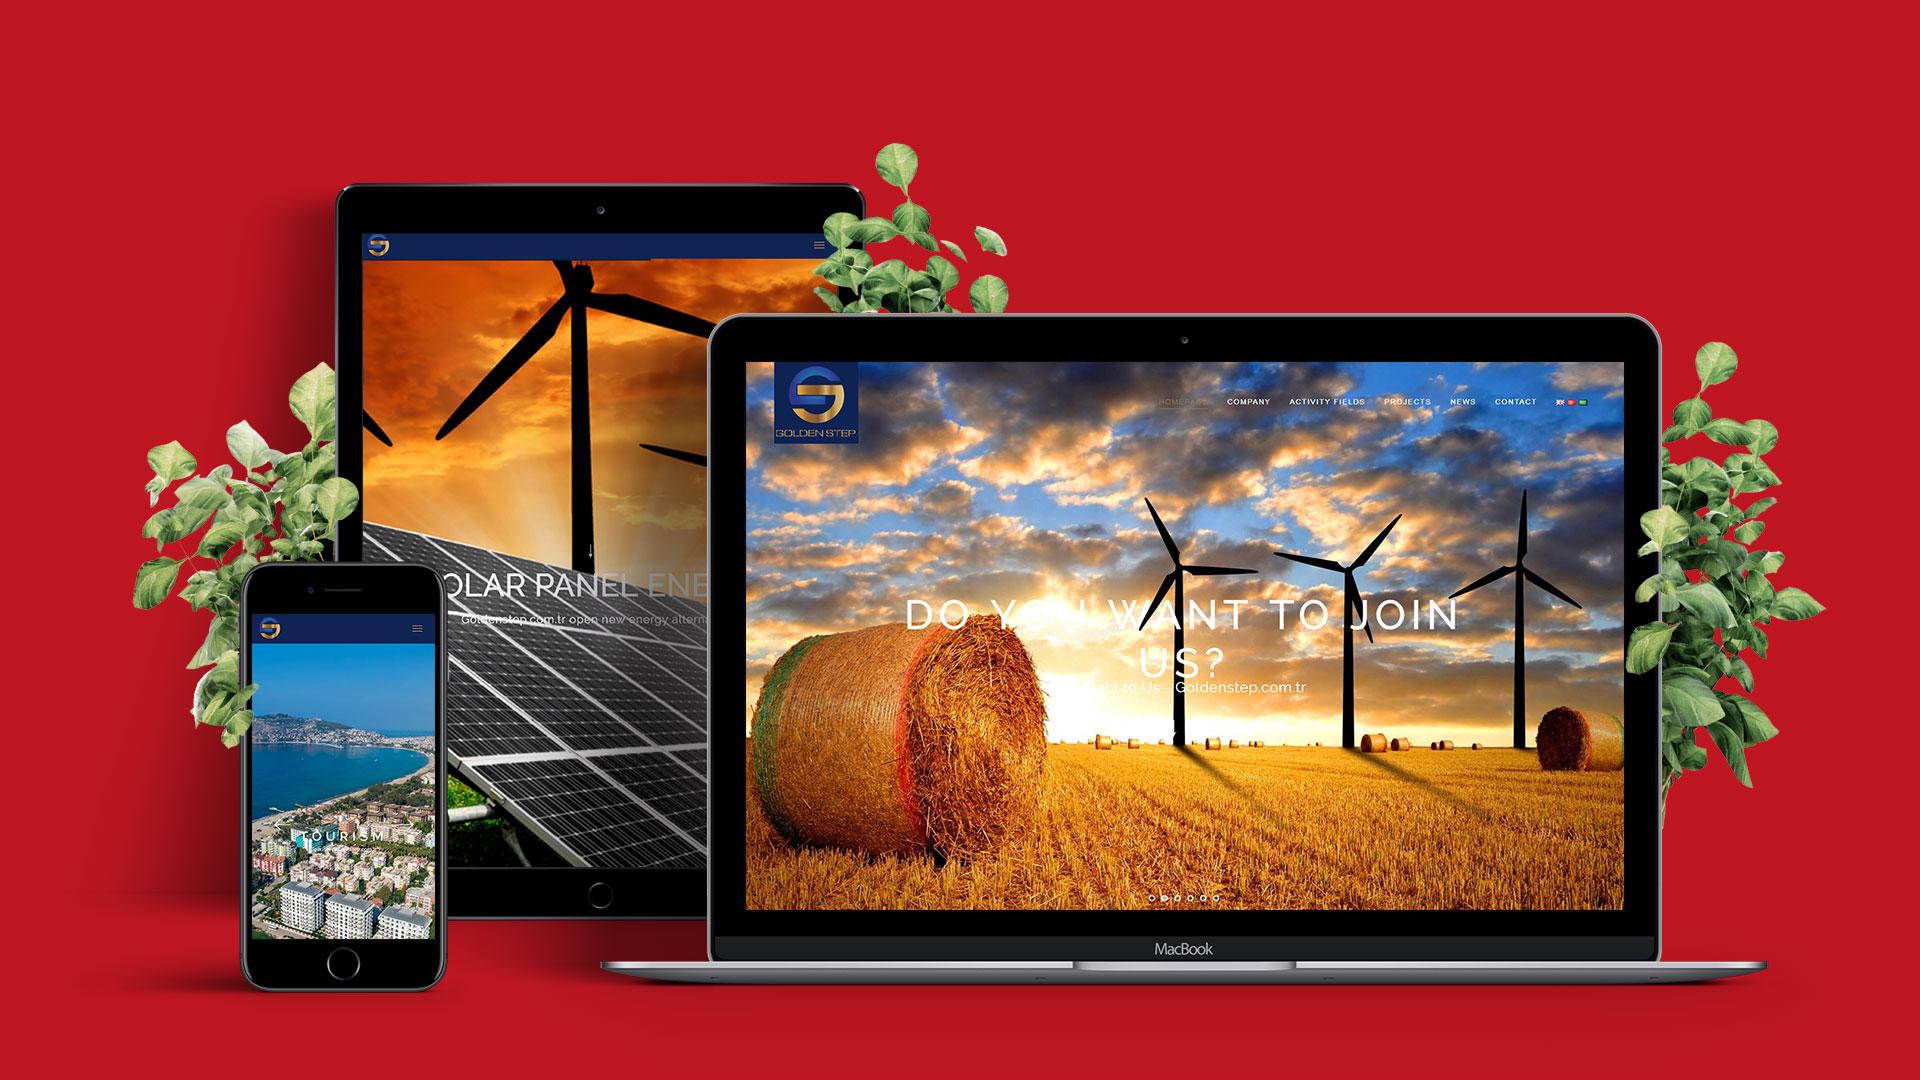 webfili-goldenstep-enerji-tarım-turizm-alanya-01.jpg